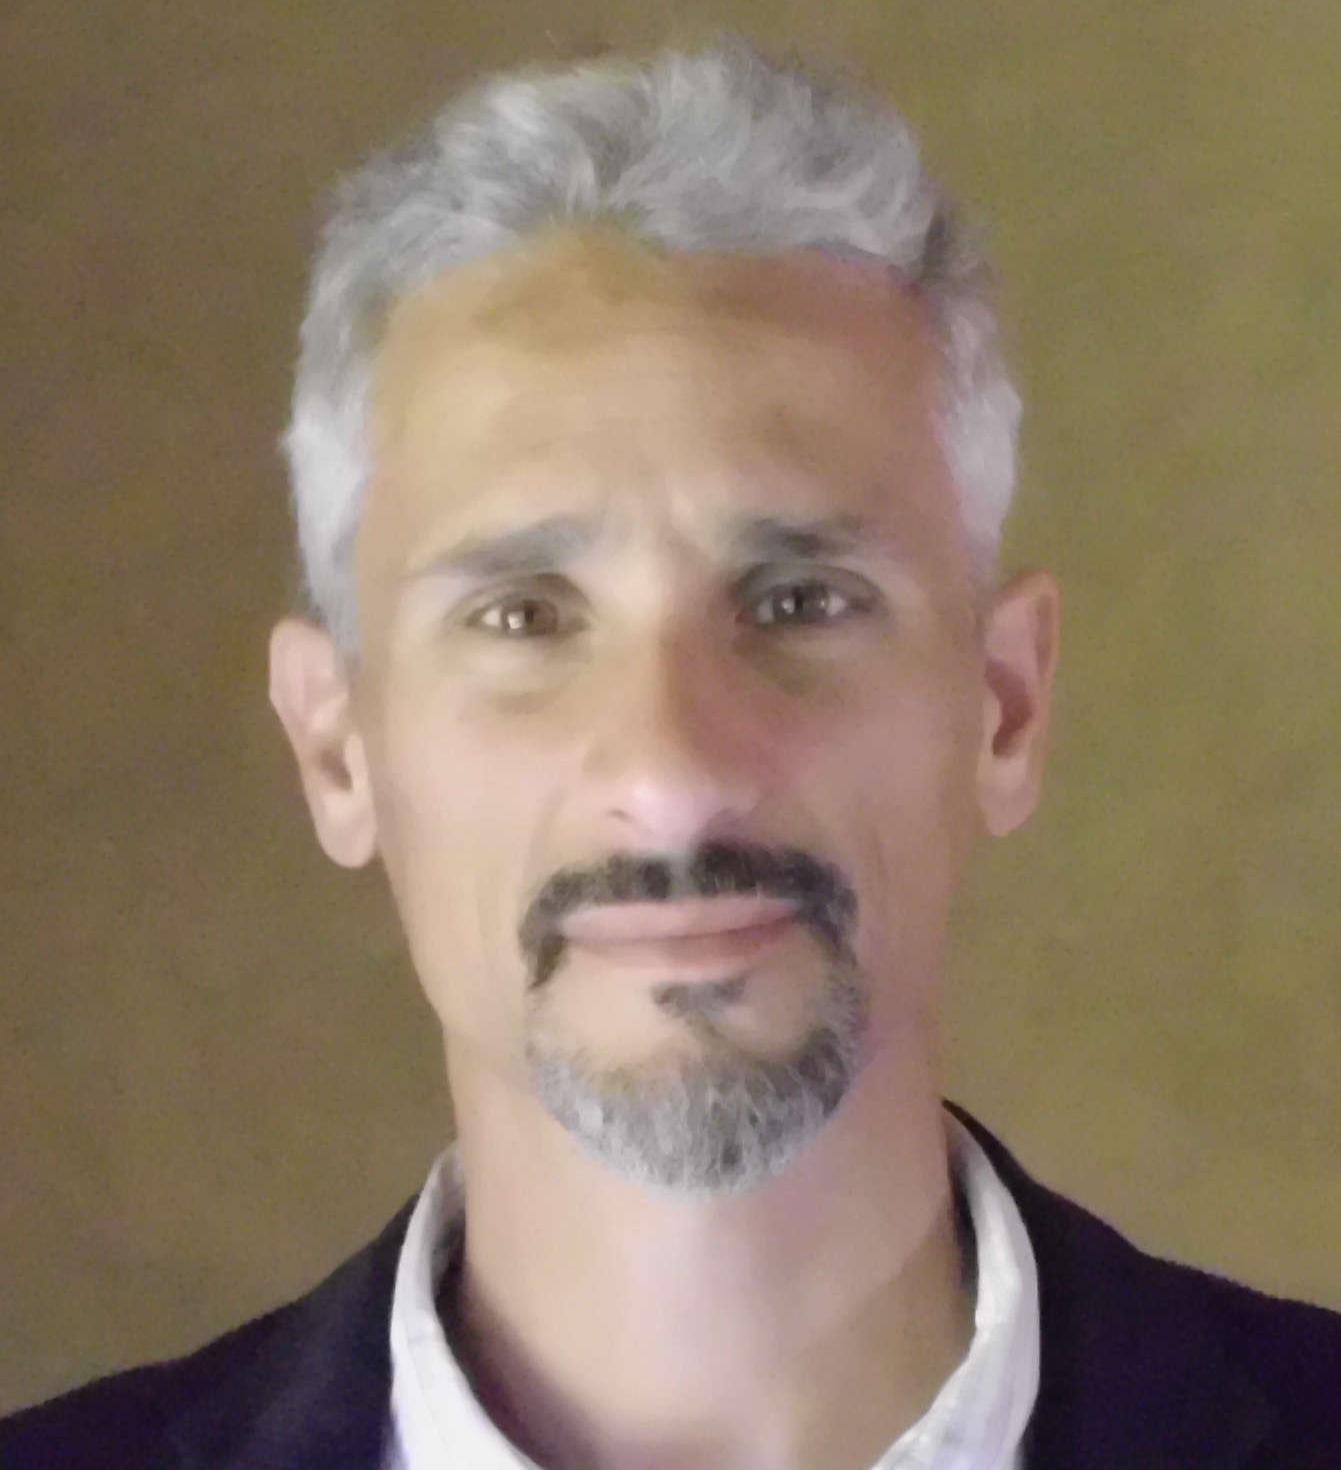 Arturo Benigno Gasparini